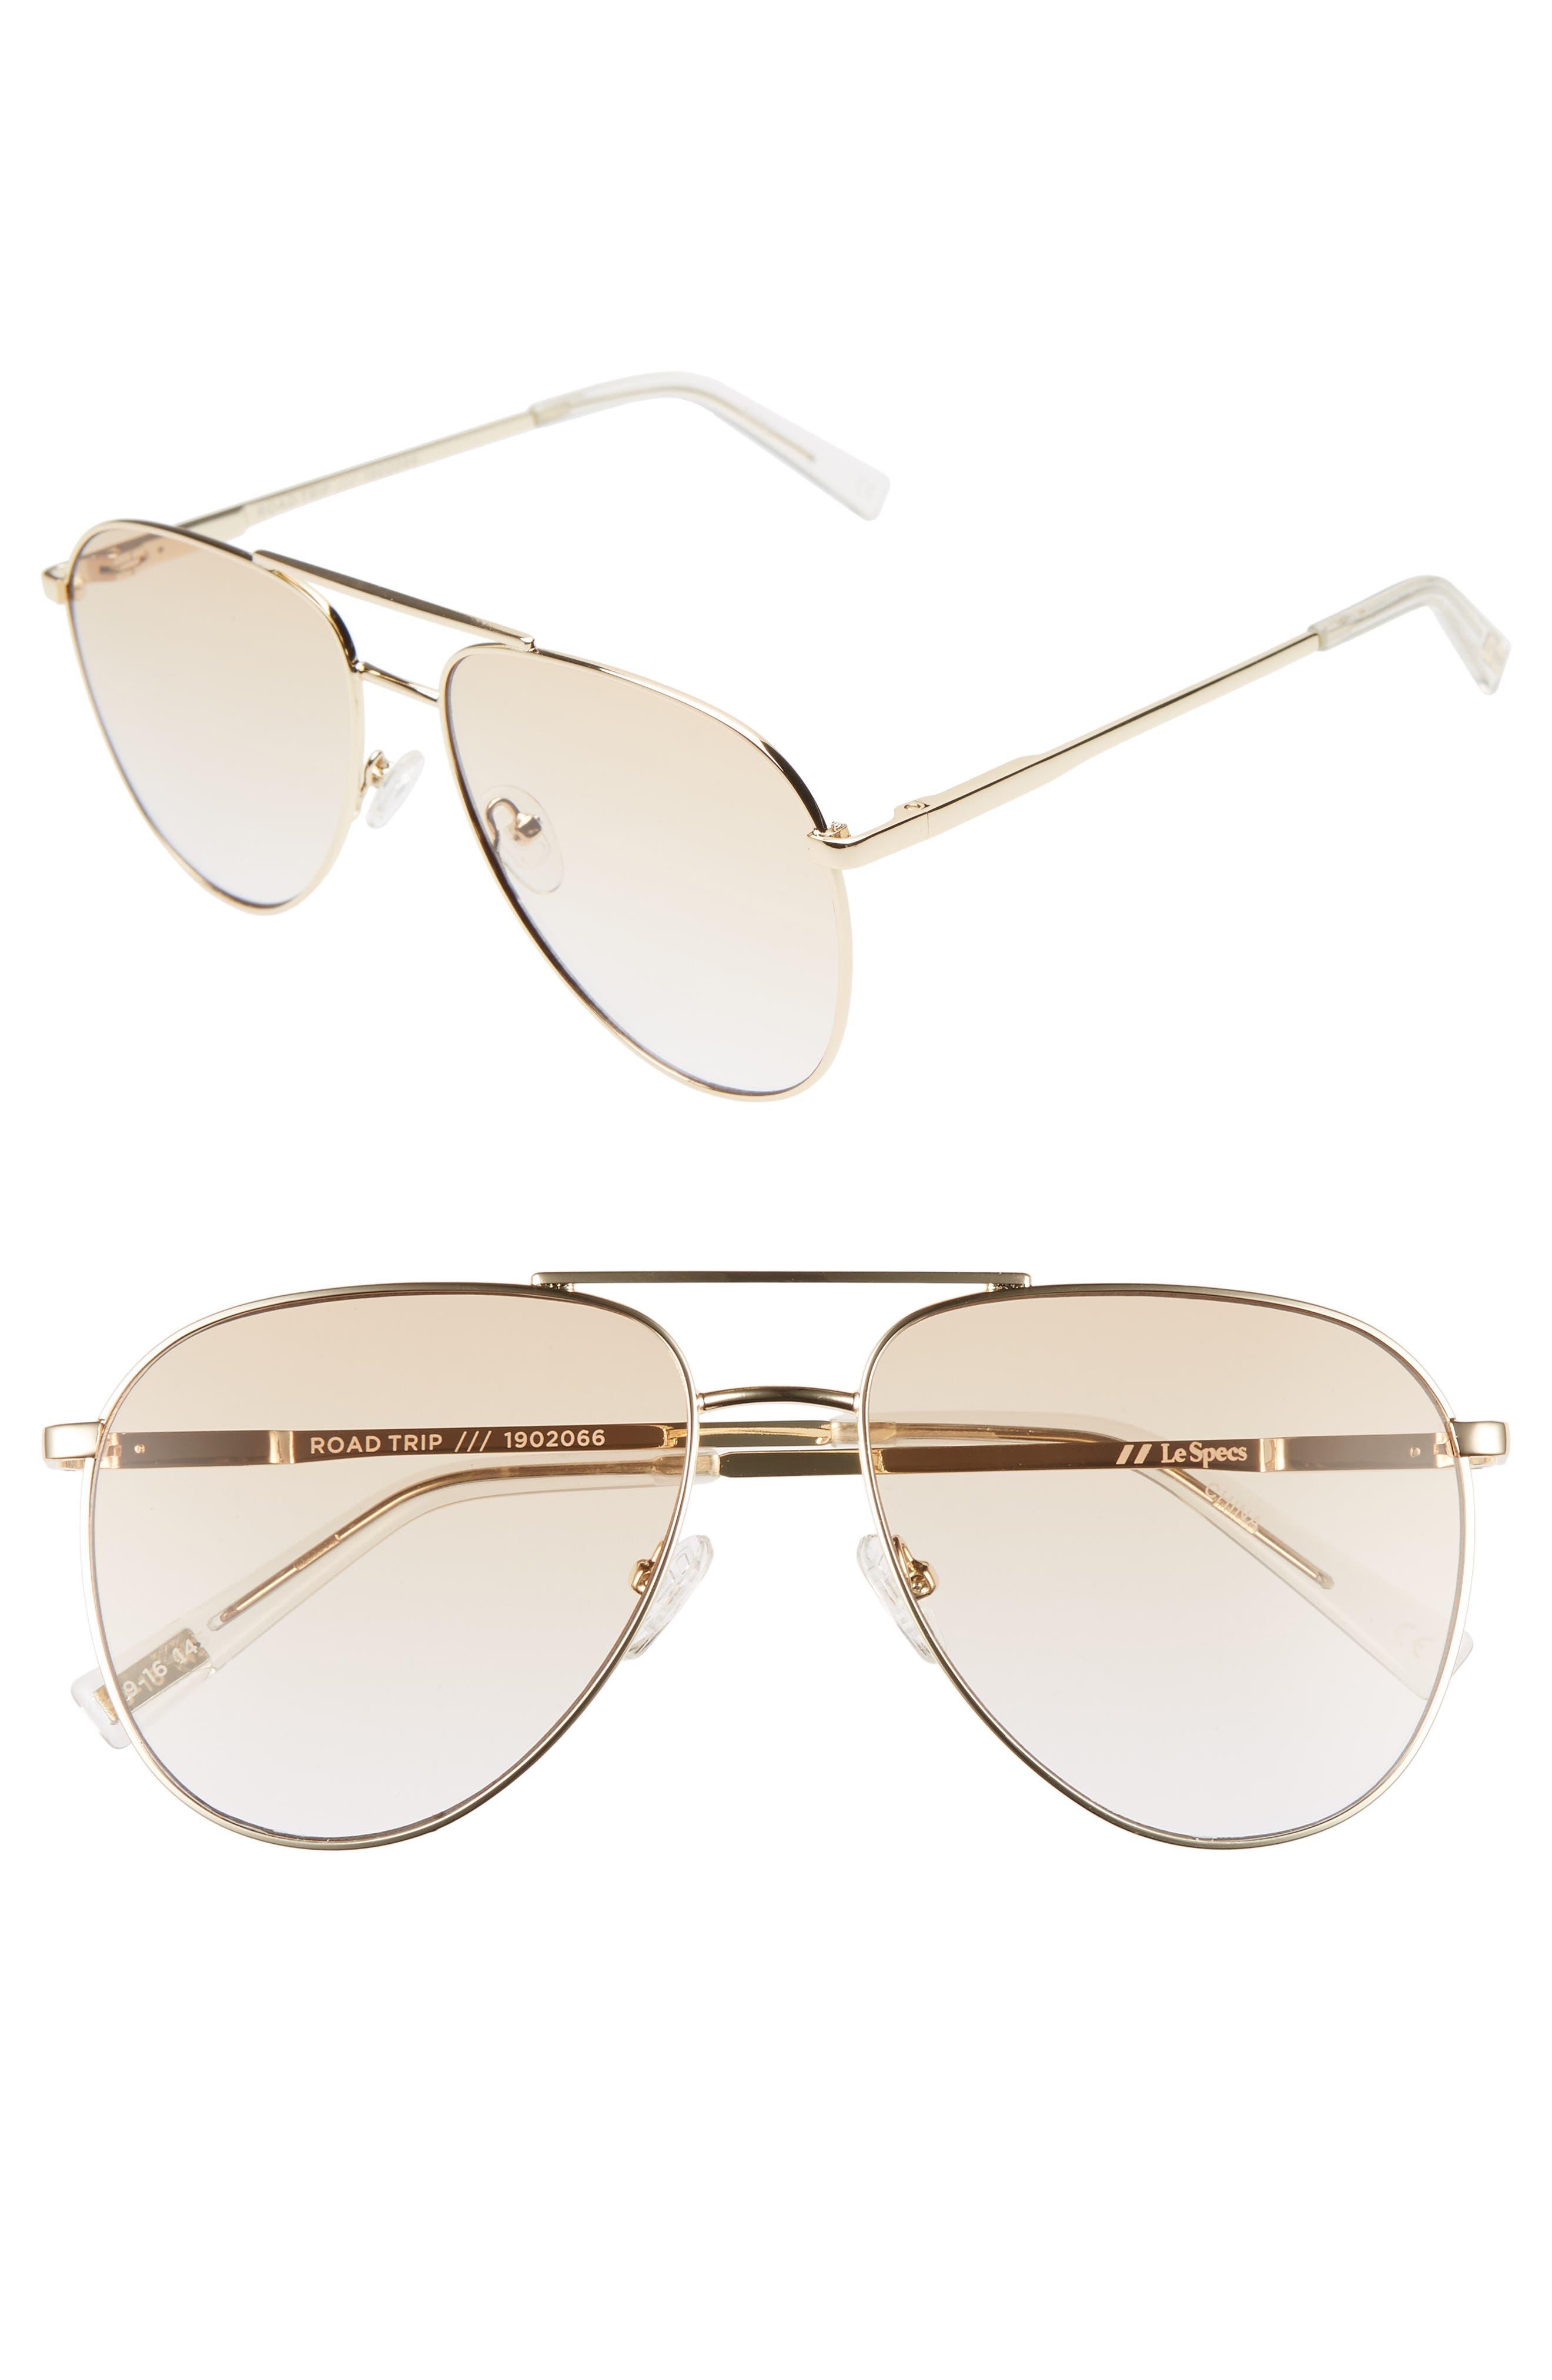 Le Specs Road Trip 5m Aviator Sunglasses - Gold/ Tan Gradient Flash